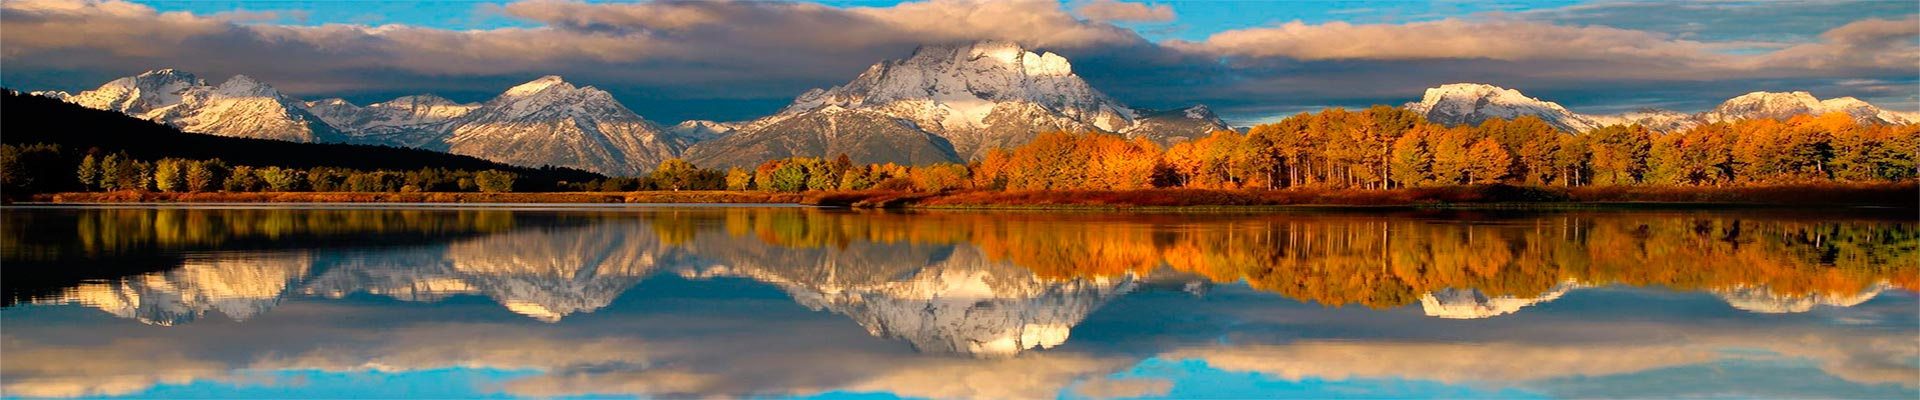 Parques Nacionais dos Estados Unidos